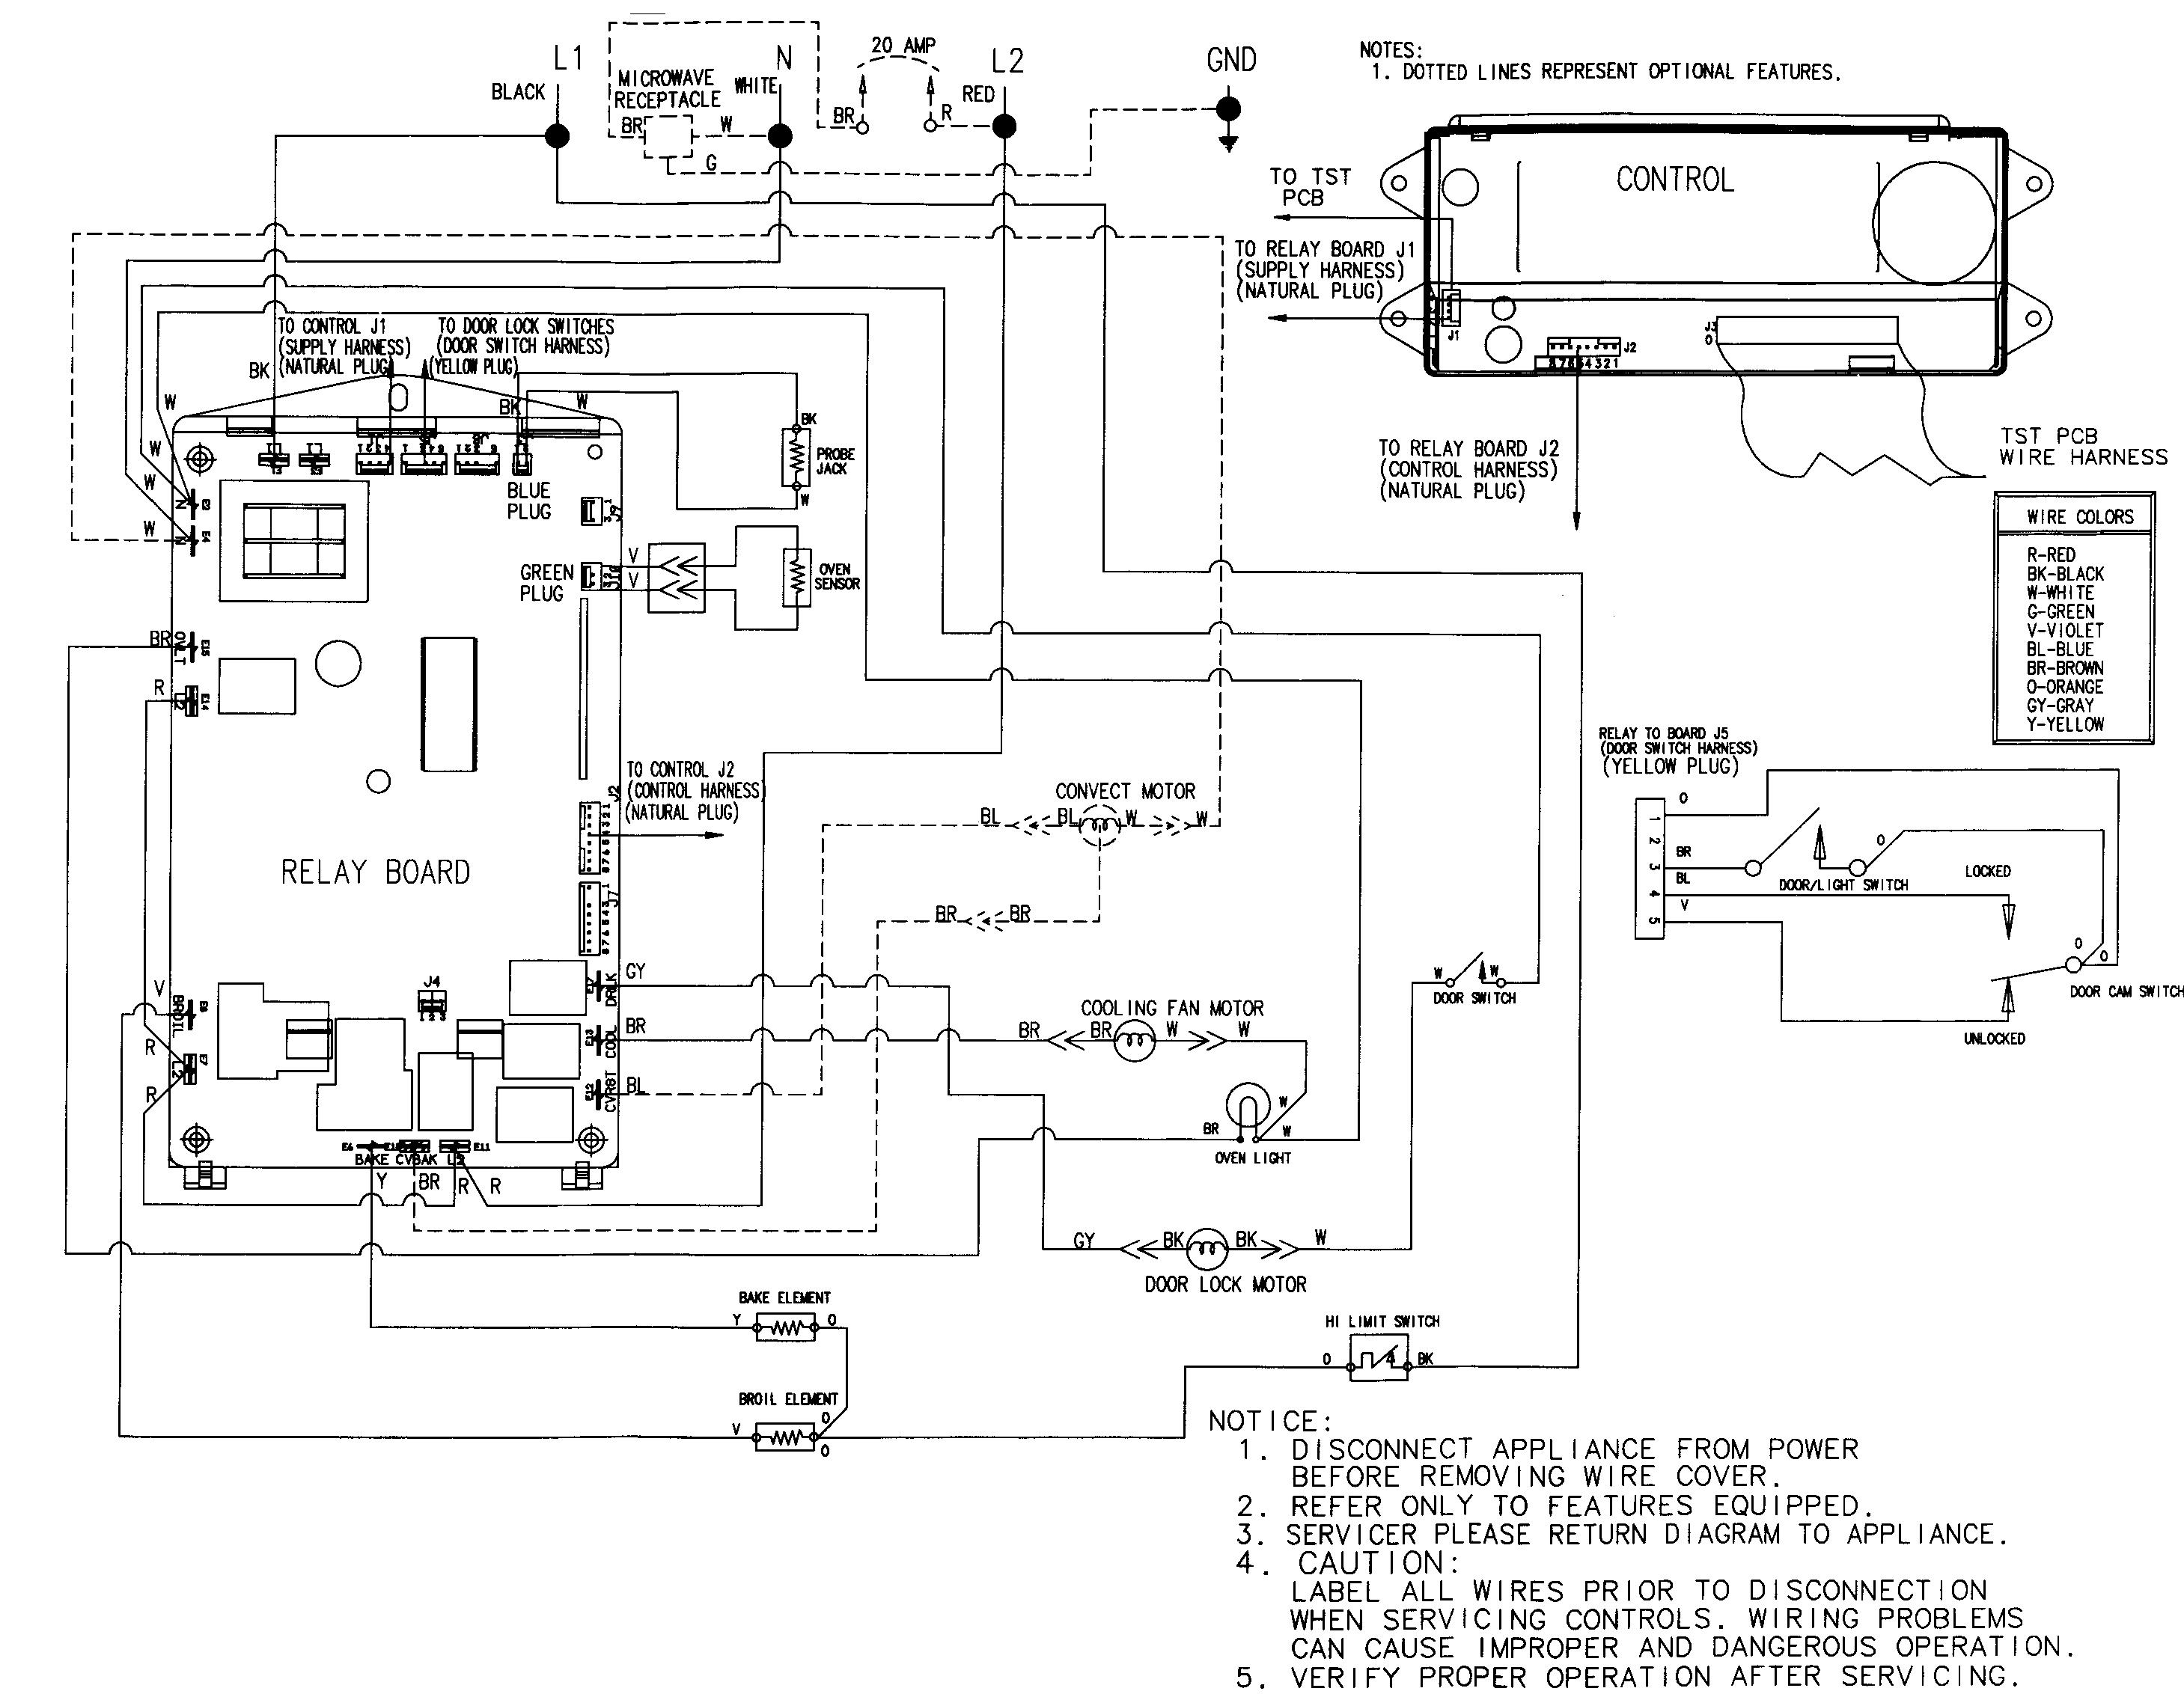 Admiral Cooktop Wiring Diagram - Ignition Wiring Diagram 1999 Mercruiser 4  3 Vortec V6 - fuses-boxs.nescafe.jeanjaures37.fr   Admiral Cooktop Wiring Diagram      Wiring Diagram Resource